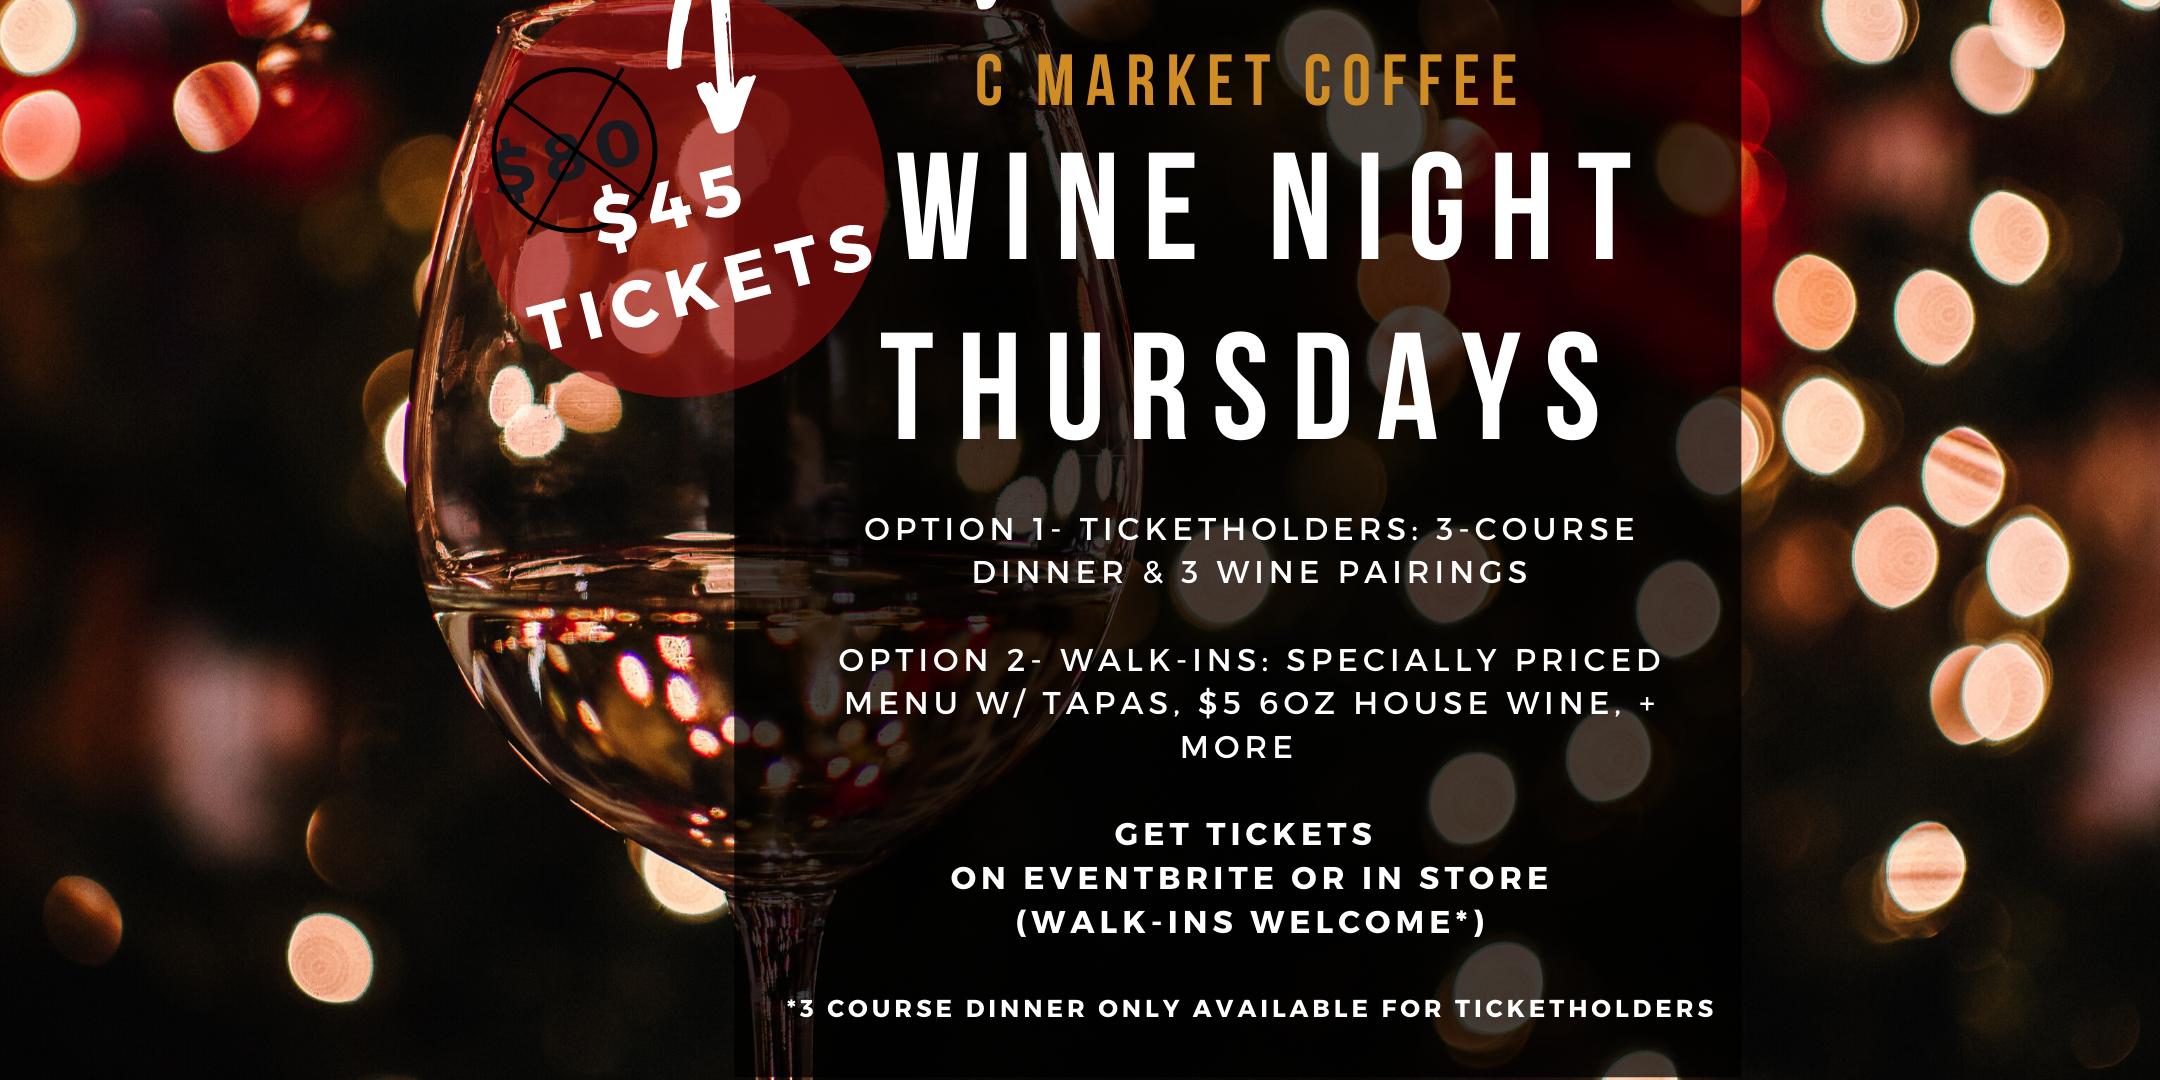 C Market Coffee Wine Night Thursdays